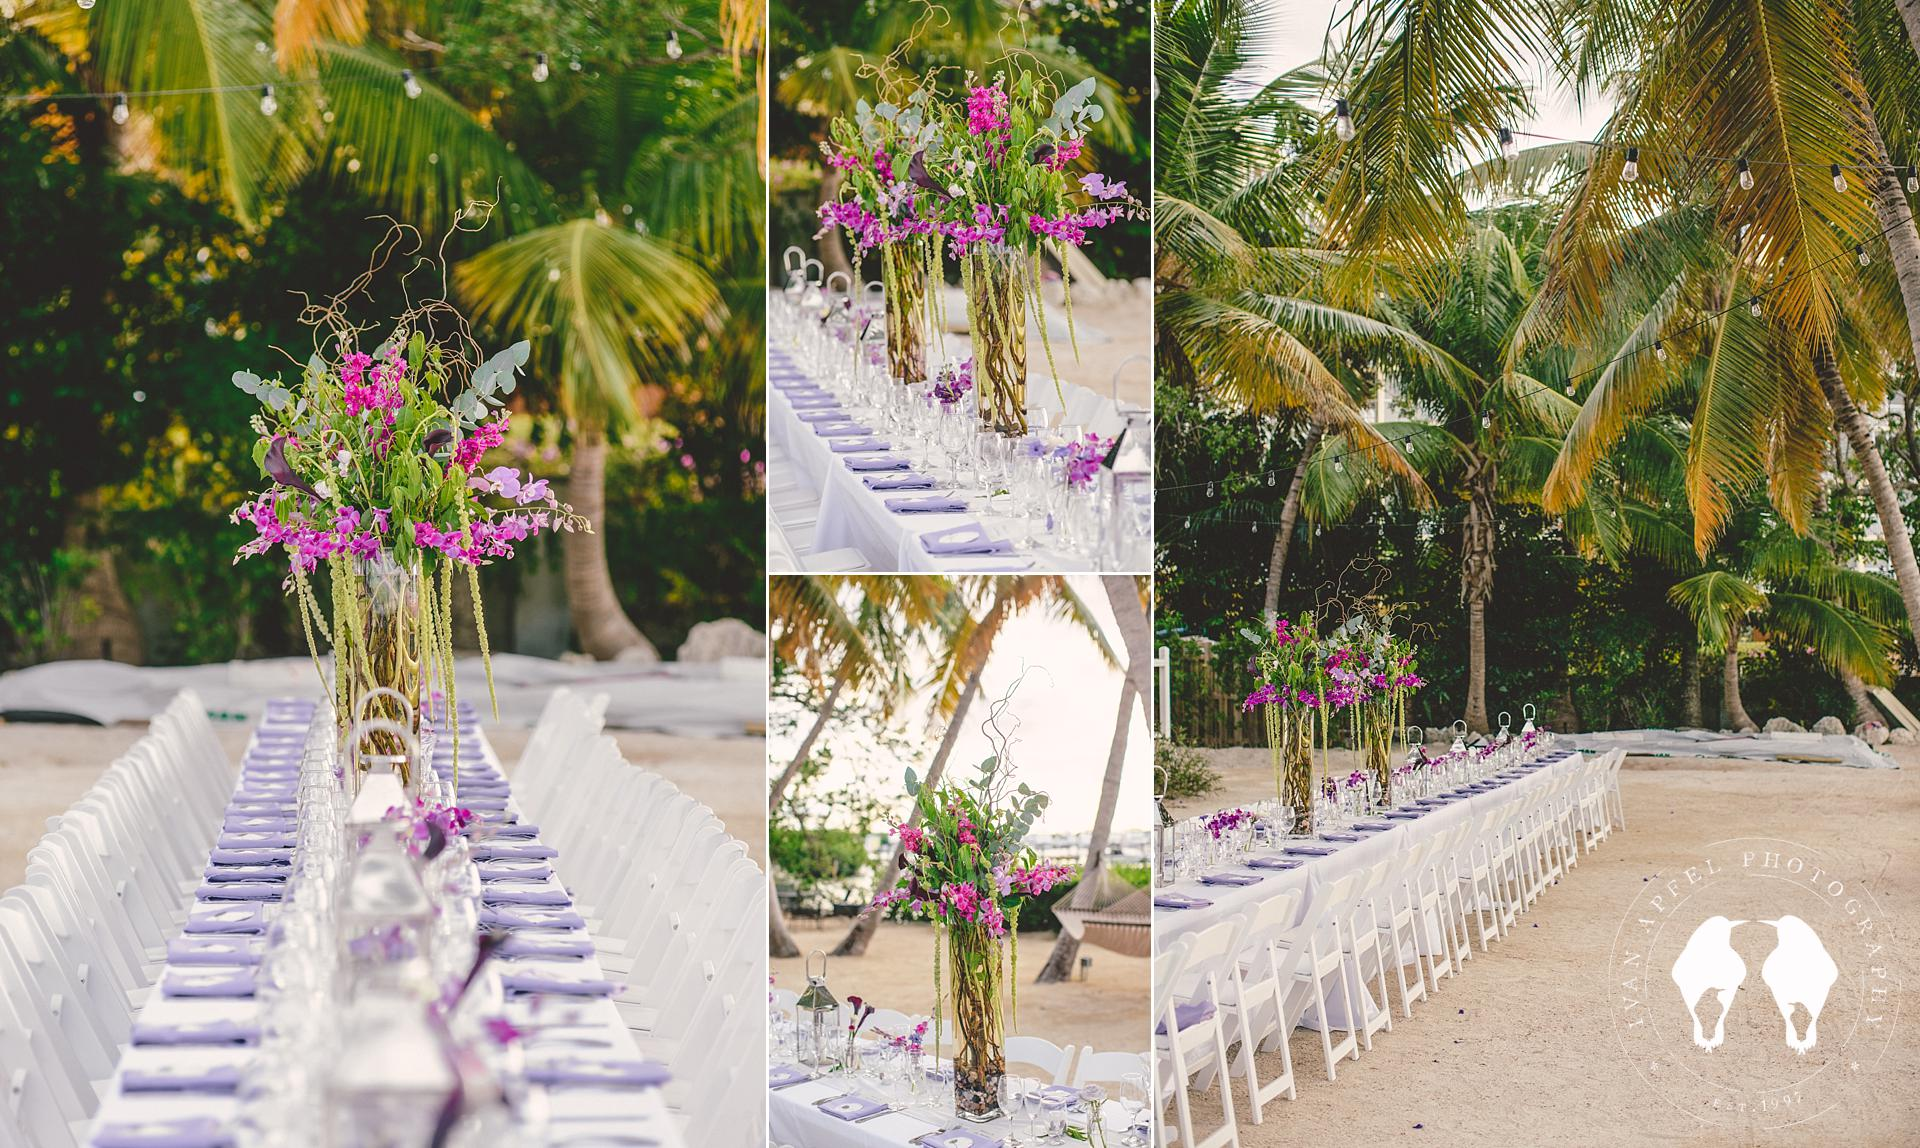 Islamorada-Wedding-Post-Card-Inn-EandS-Ivan-Apfel-Photography_0047.jpg